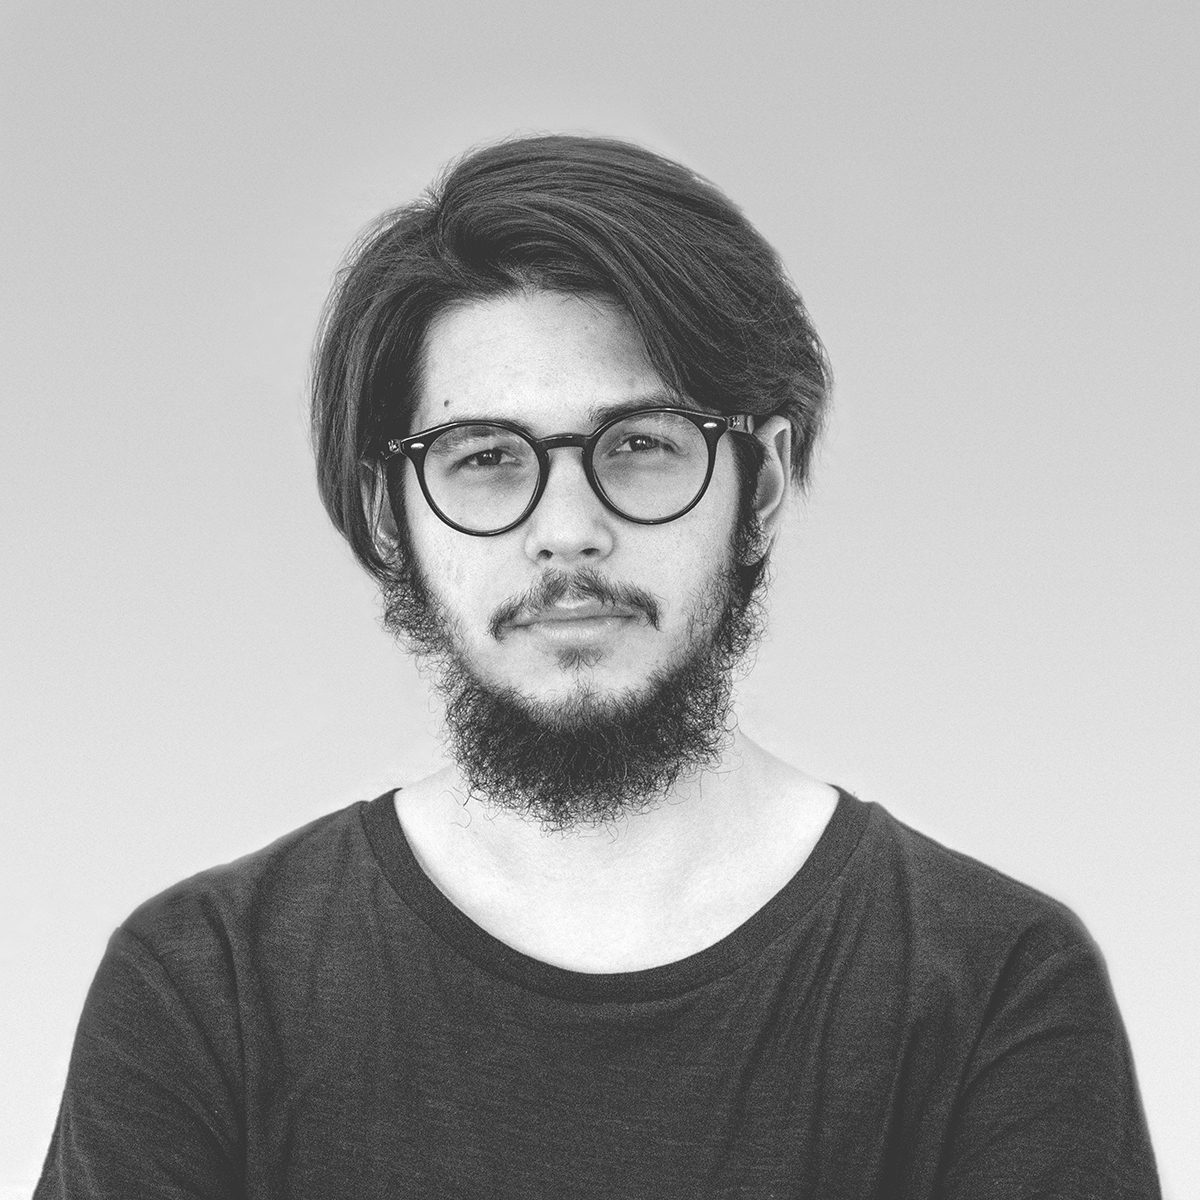 Andras Kokai - Industrial & UI/UX Designer